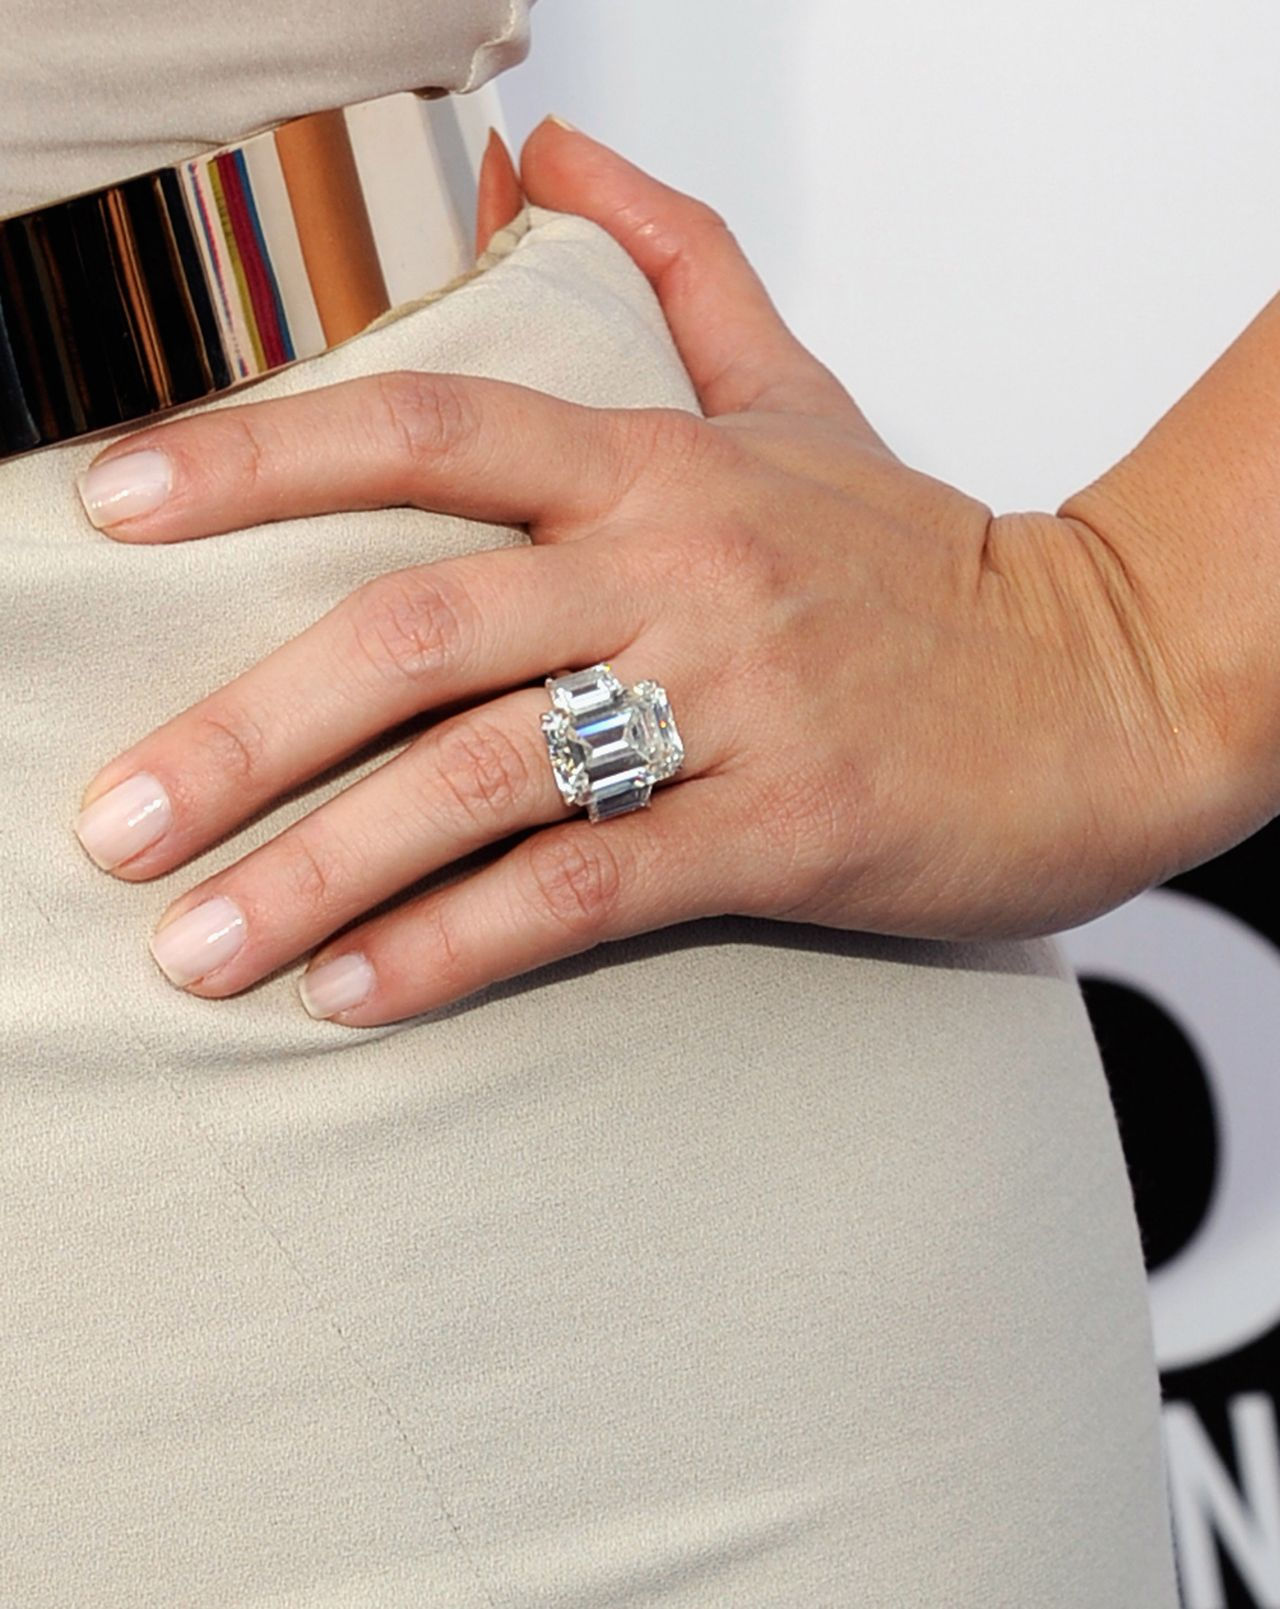 most expensive wedding rings Melania Trump s 15 Carat Emerald cut ring is huge but tasteful